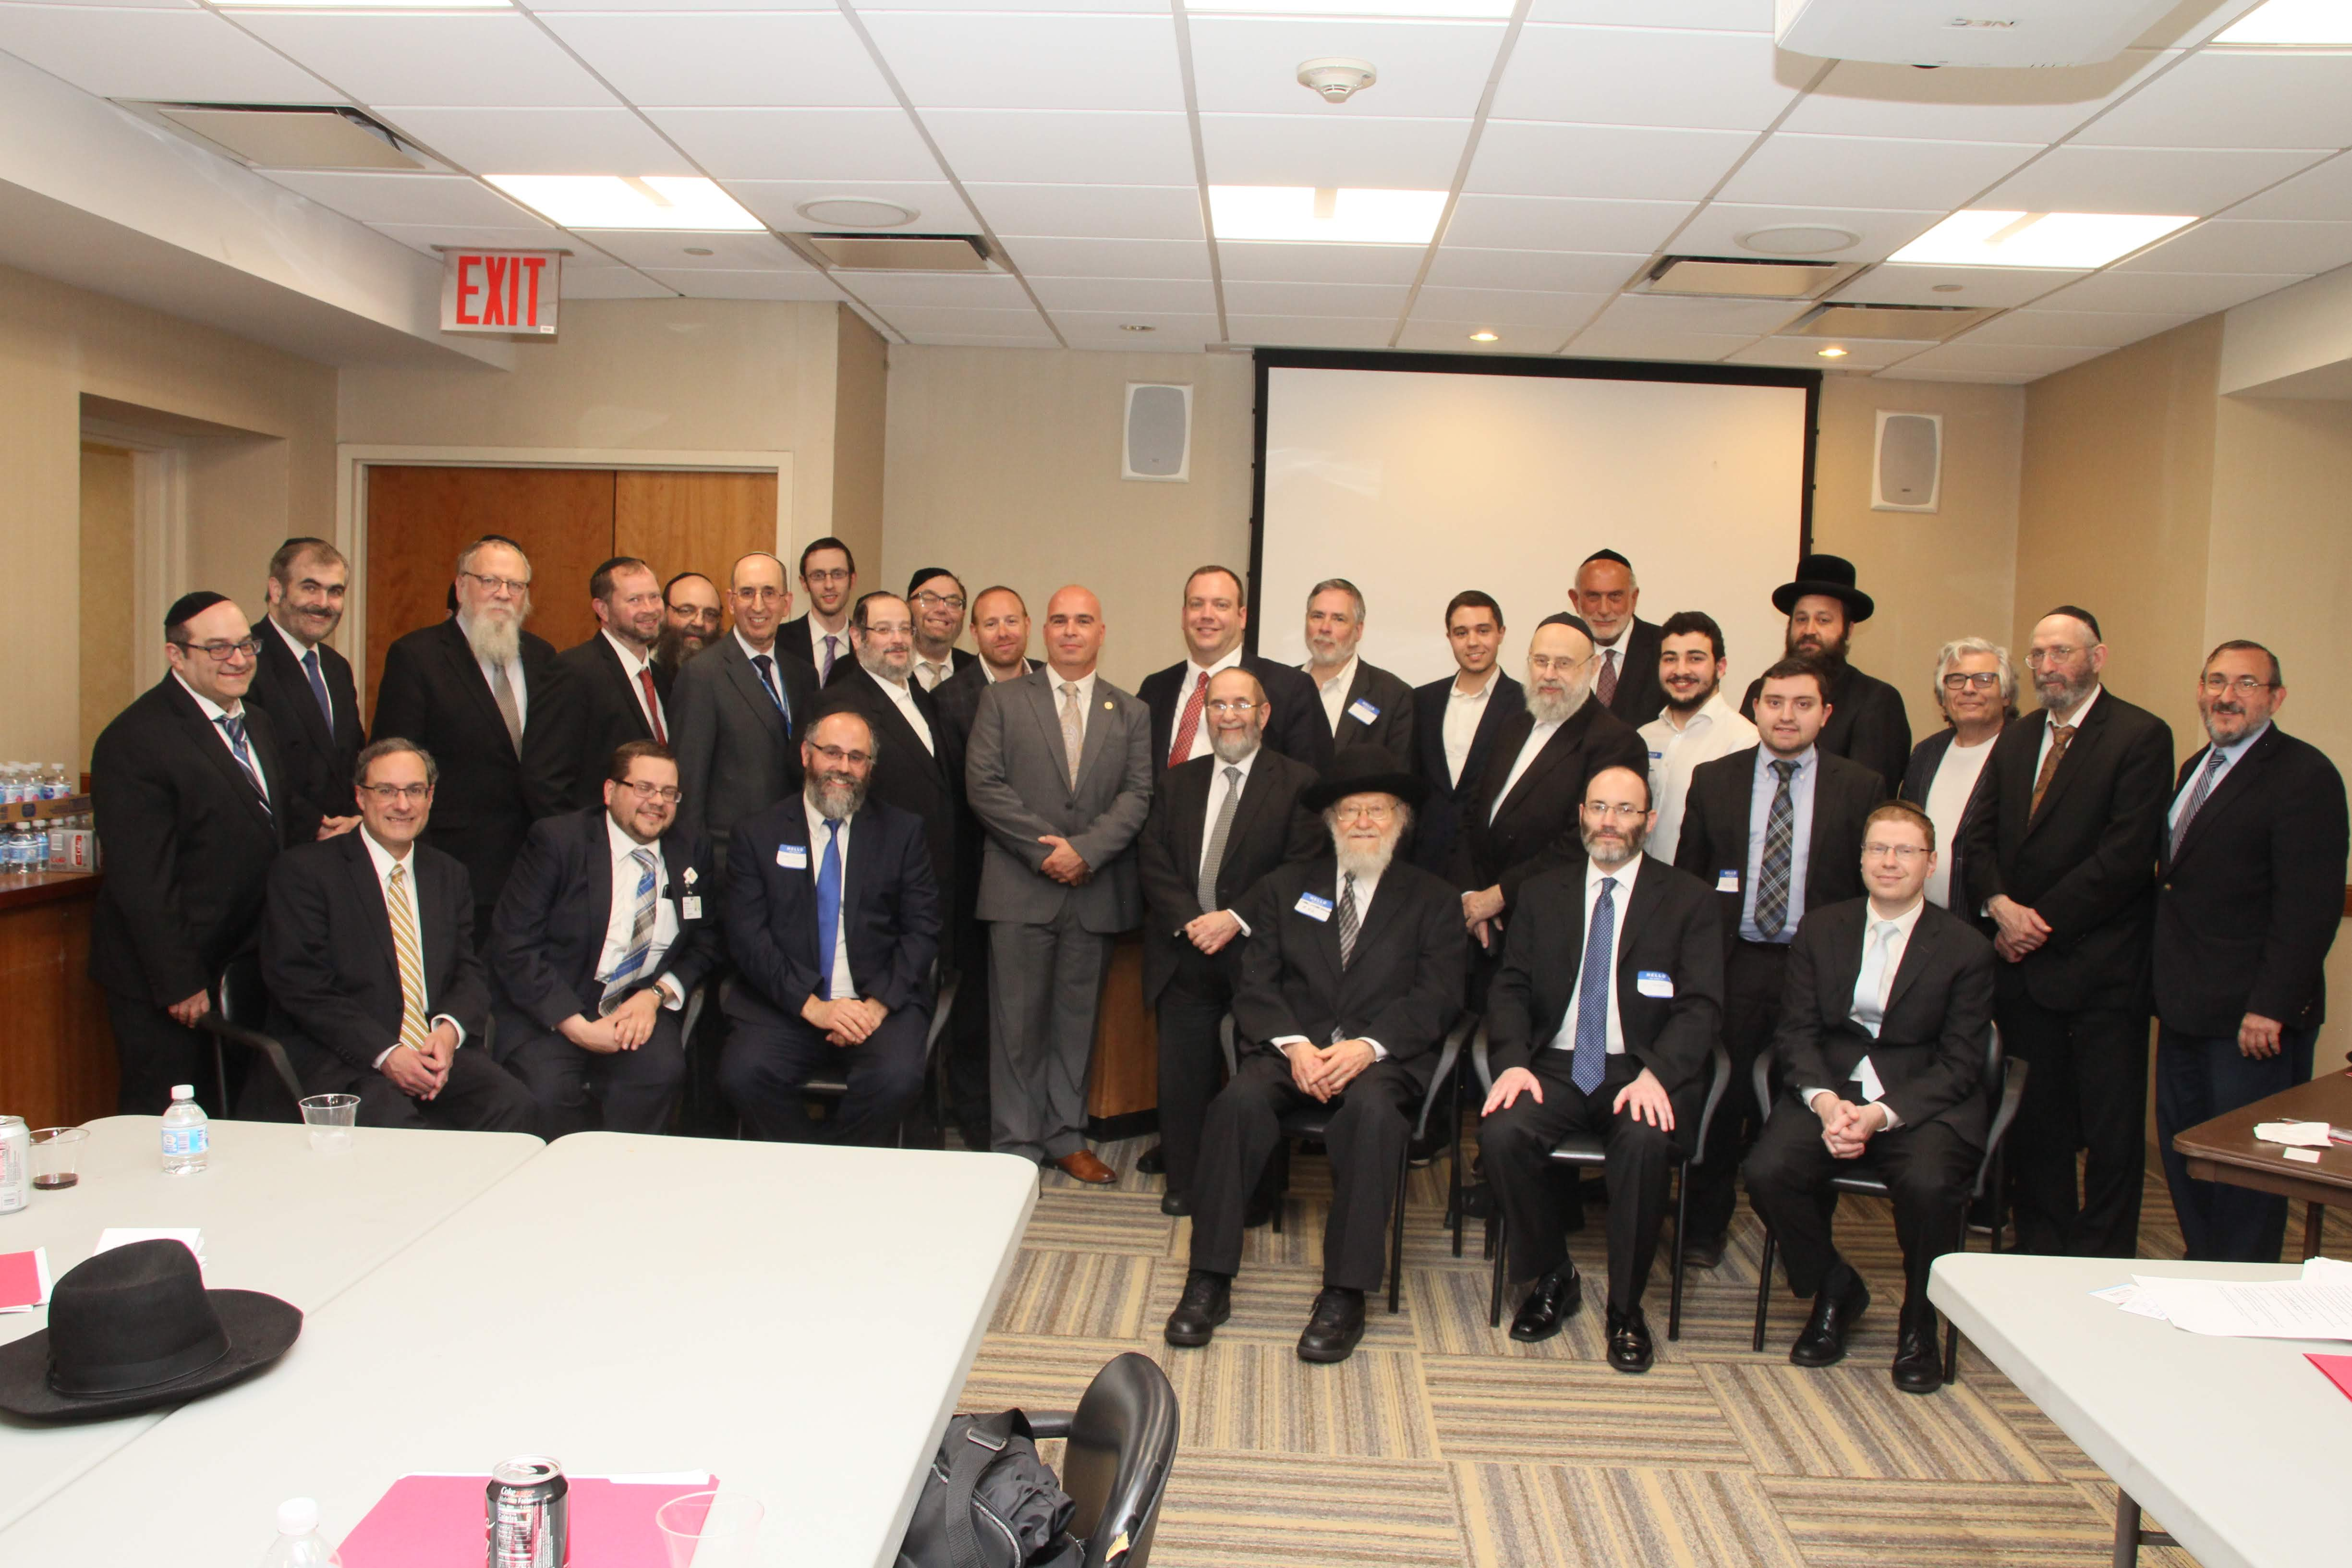 Rabbis Learn About Self-Care - RAA Igud HaRabbonim